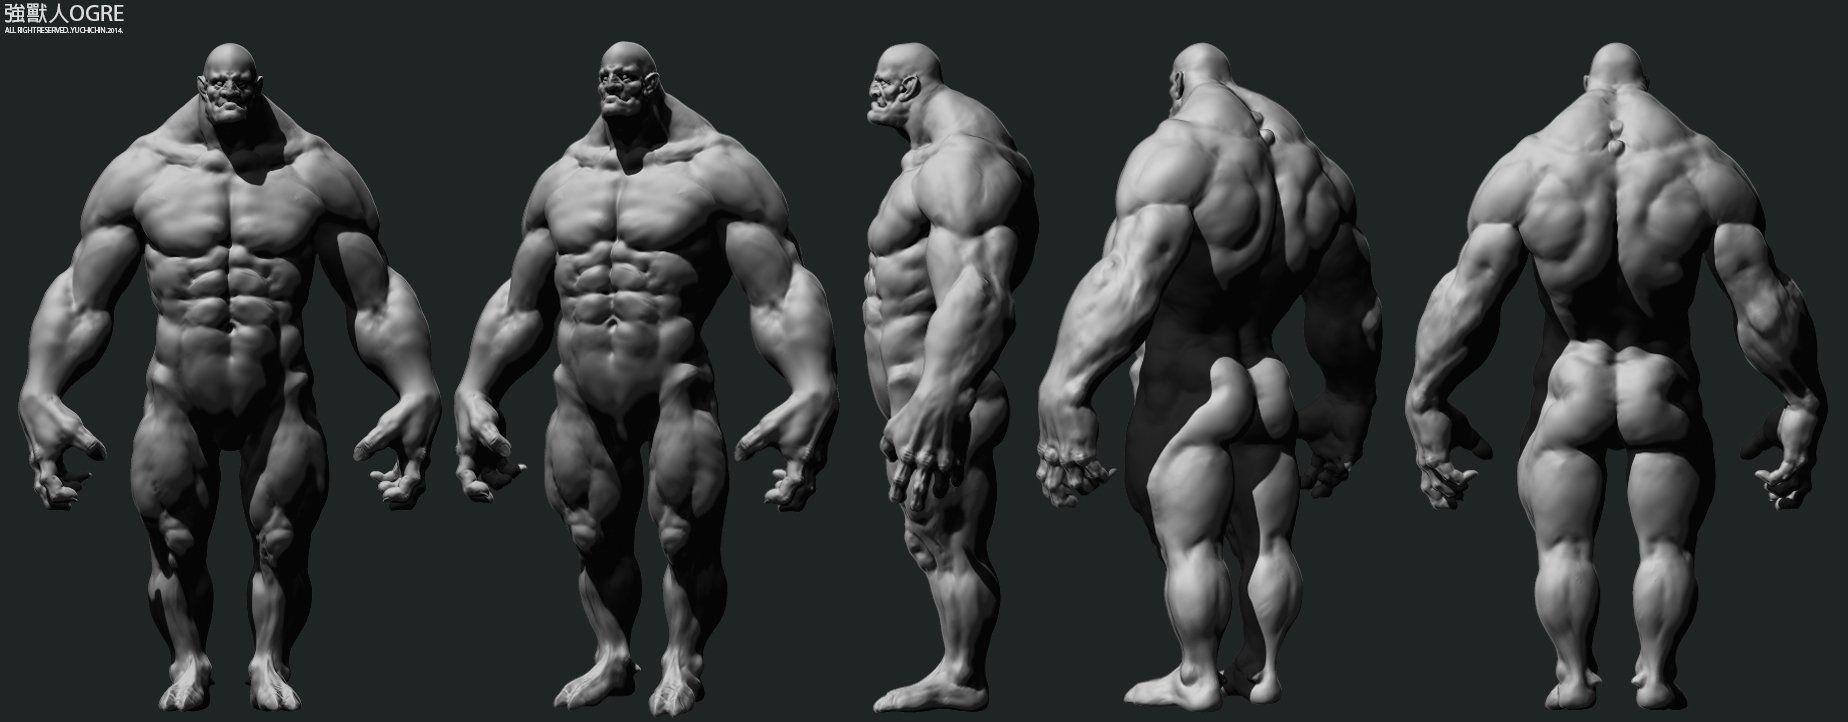 ArtStation - Ogre, YuChi Chin | 3D Muscle male | Pinterest | 3d ...